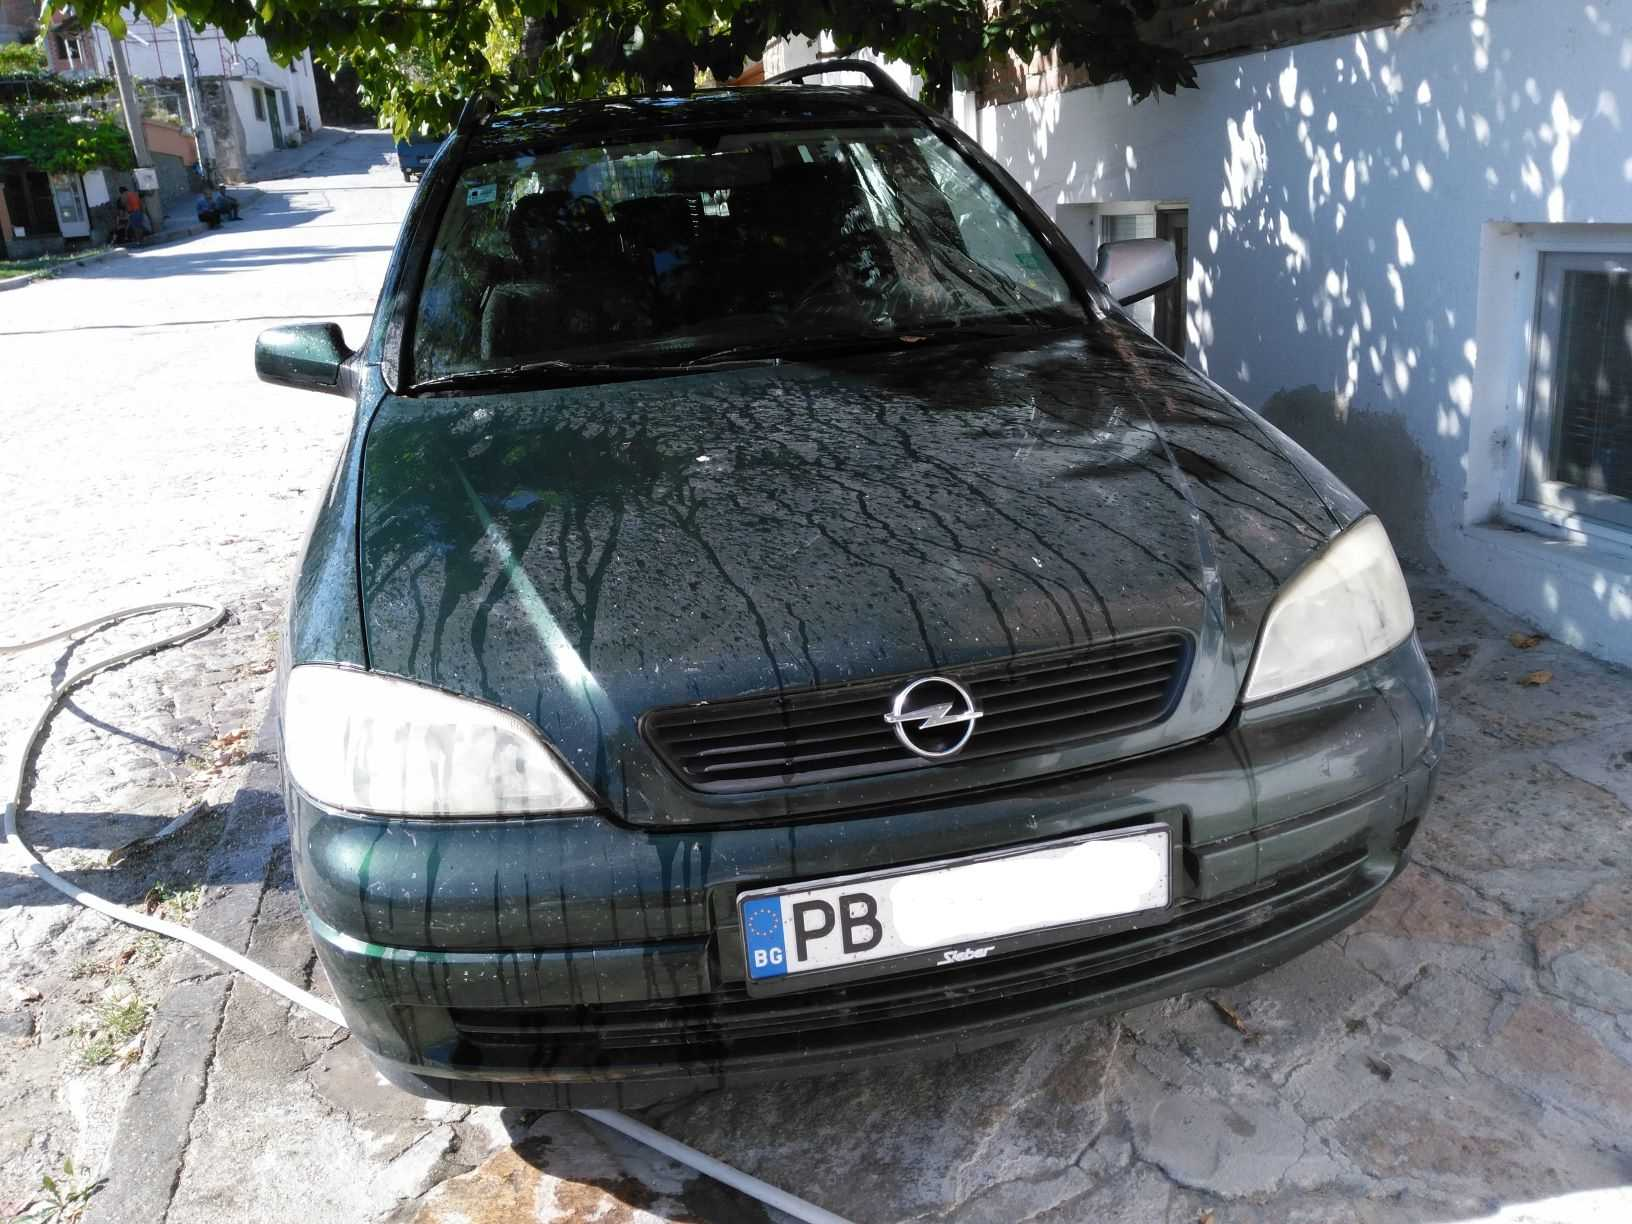 Opel Astra G 1 6 8v Caravan 100 Yil Otopark Com Surucunun Adresi